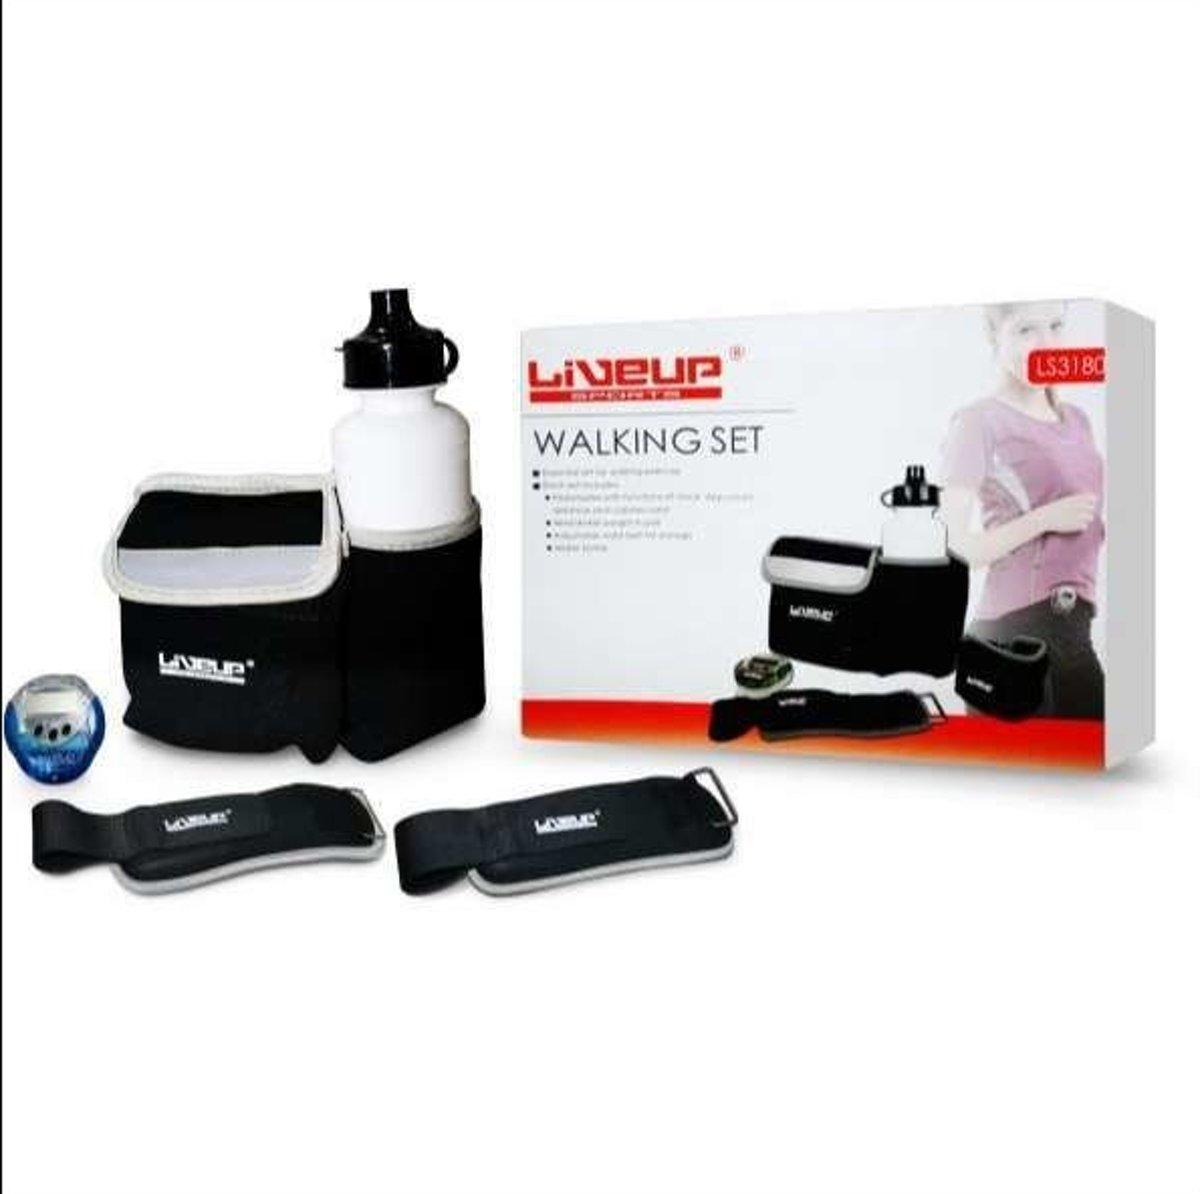 Lineup Sports wandelset - Drinkfles - Pedometer - Pols/Enkel gewicht - verstelbare riem voor opslag kopen